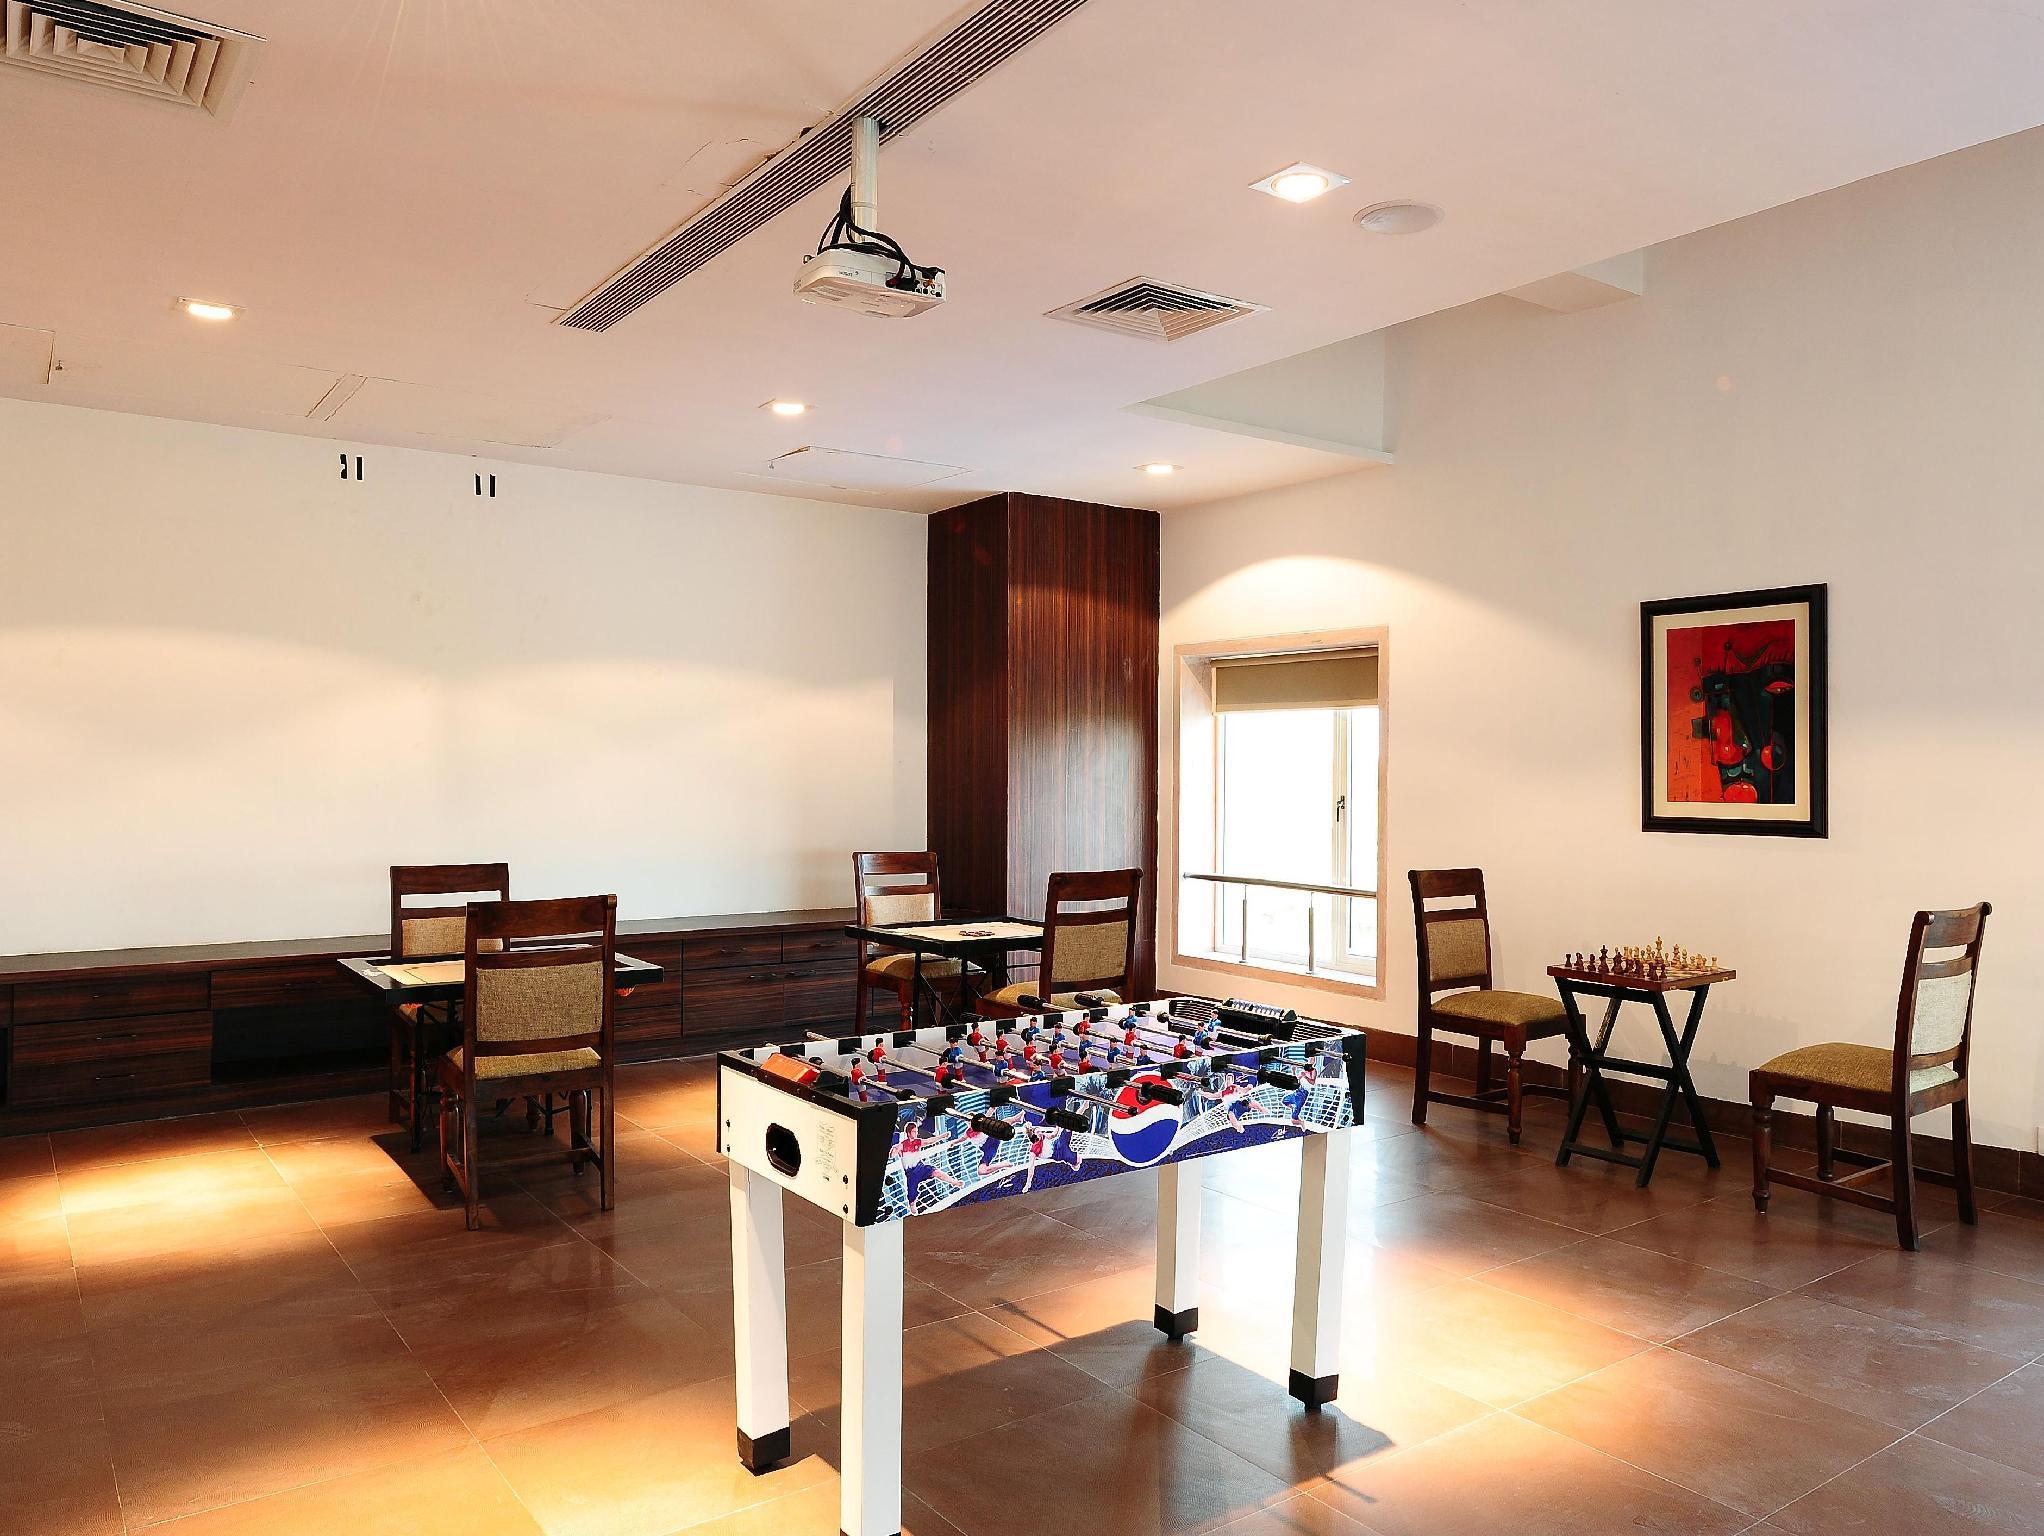 Hotel Pelangi Rooms - Apartment Green Lake View - B 0251 - Jalan Dewi Sartika Gang AR-Riyadh No 28 - Tangerang